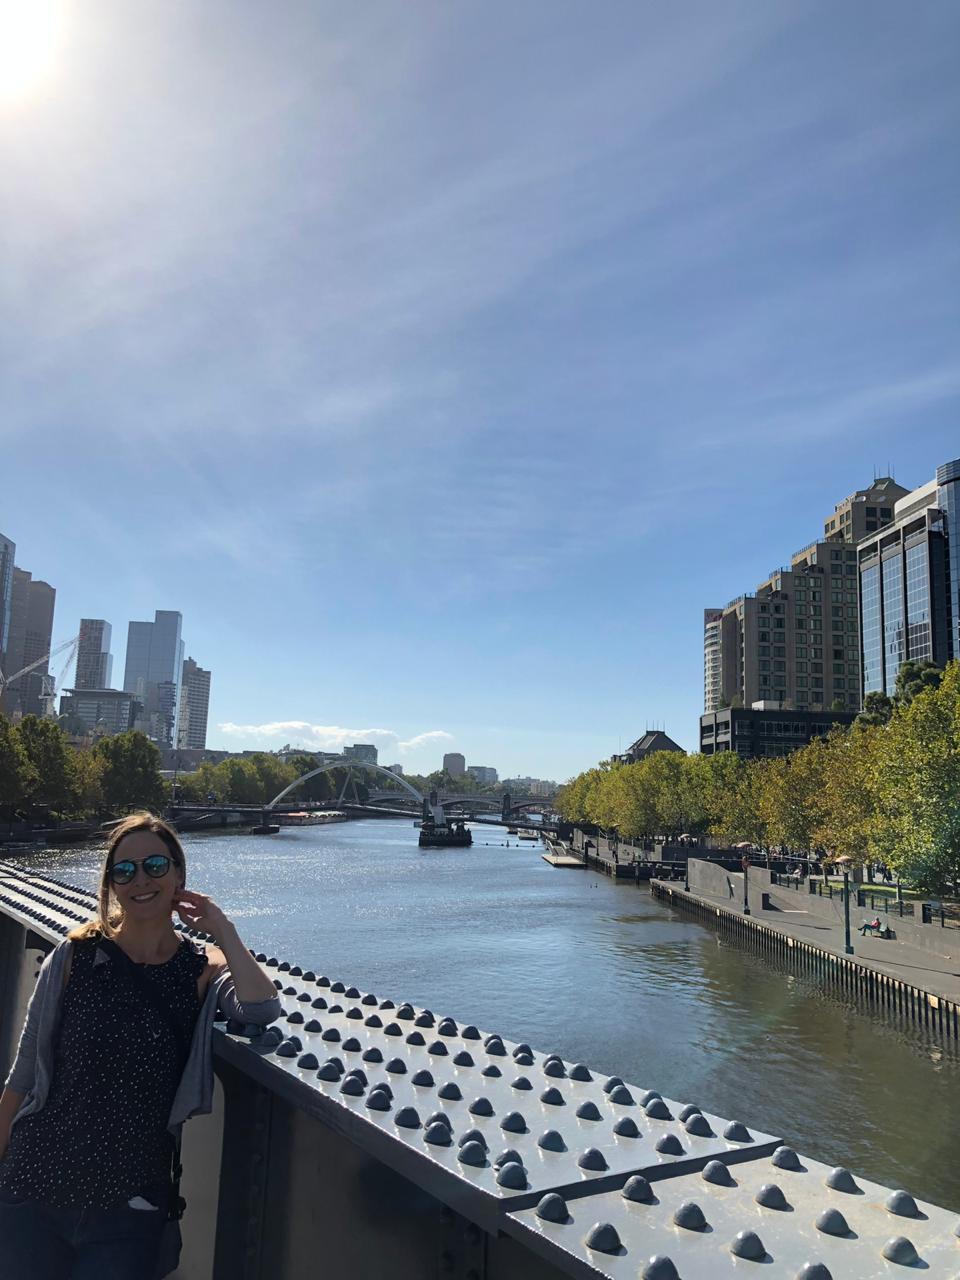 Intercâmbio em Melbourne - Yarra River